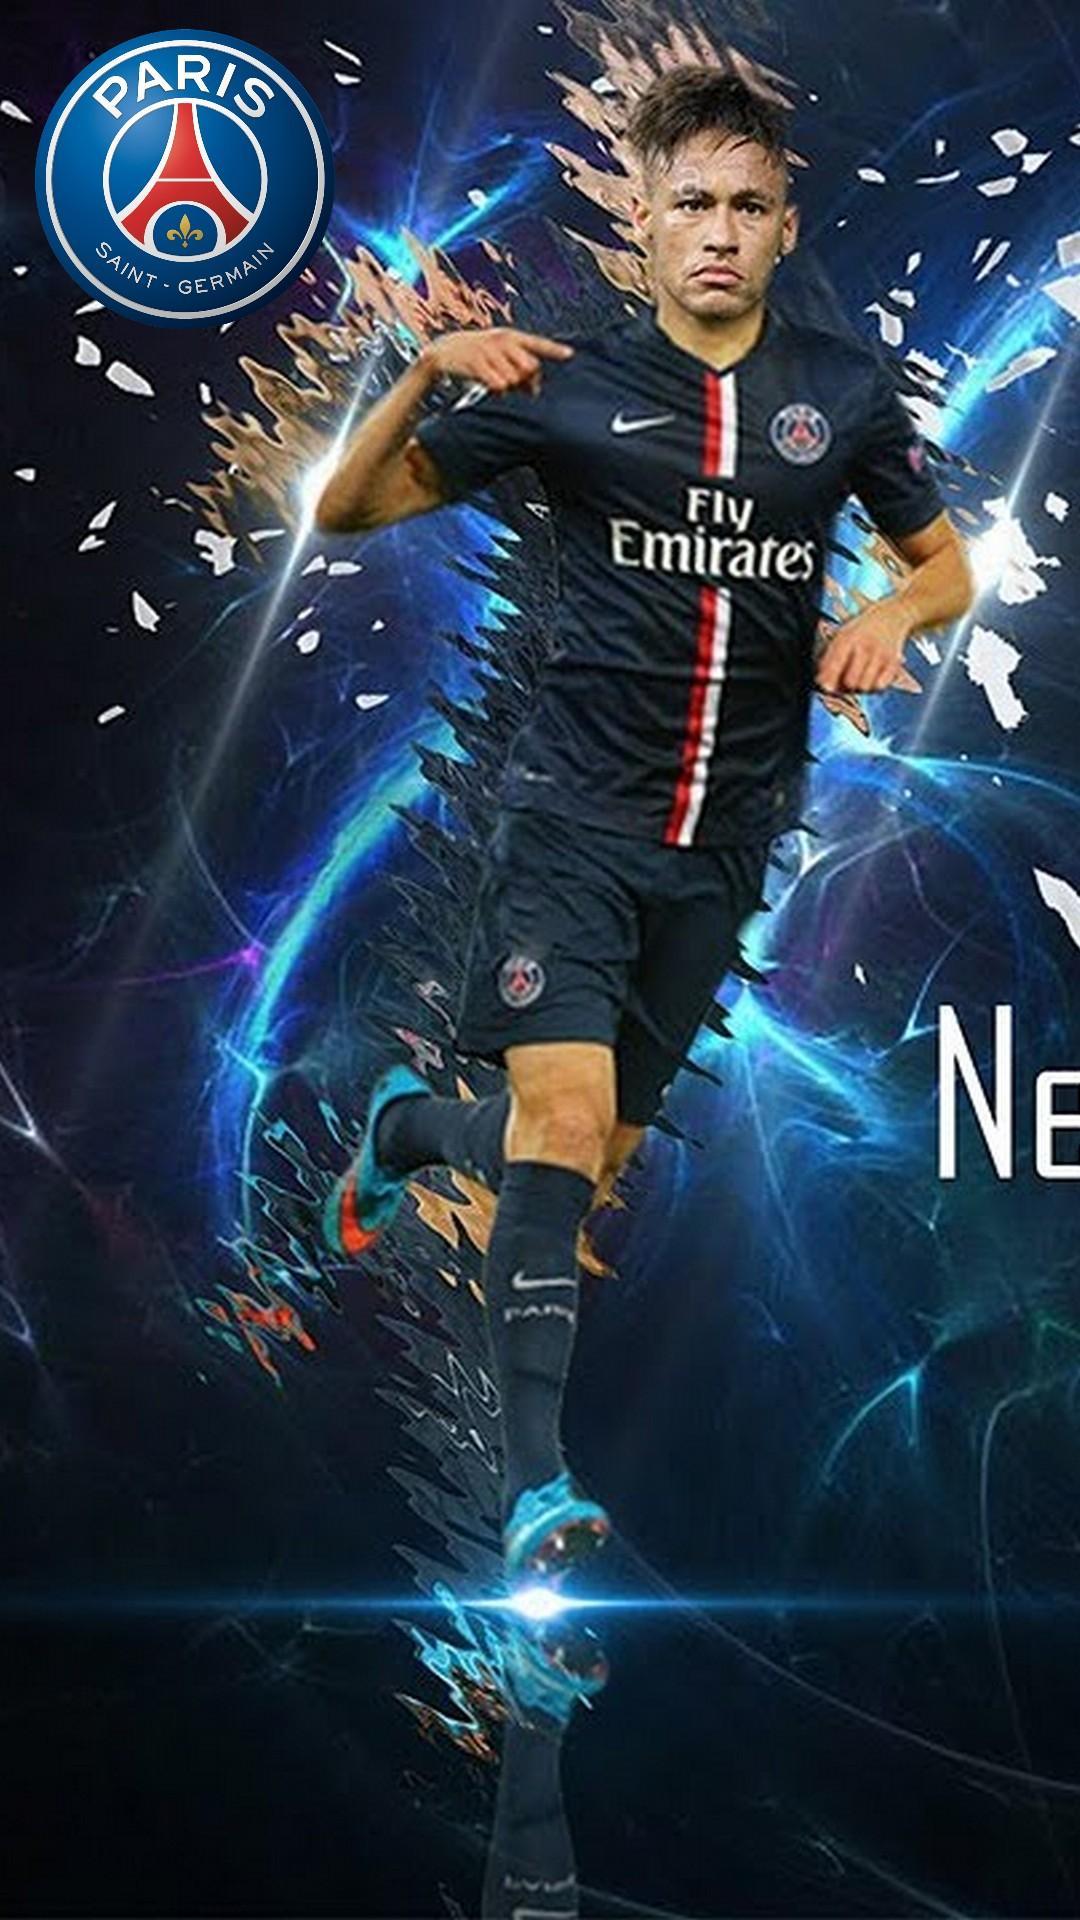 Neymar JR 2019 Wallpapers - Wallpaper Cave